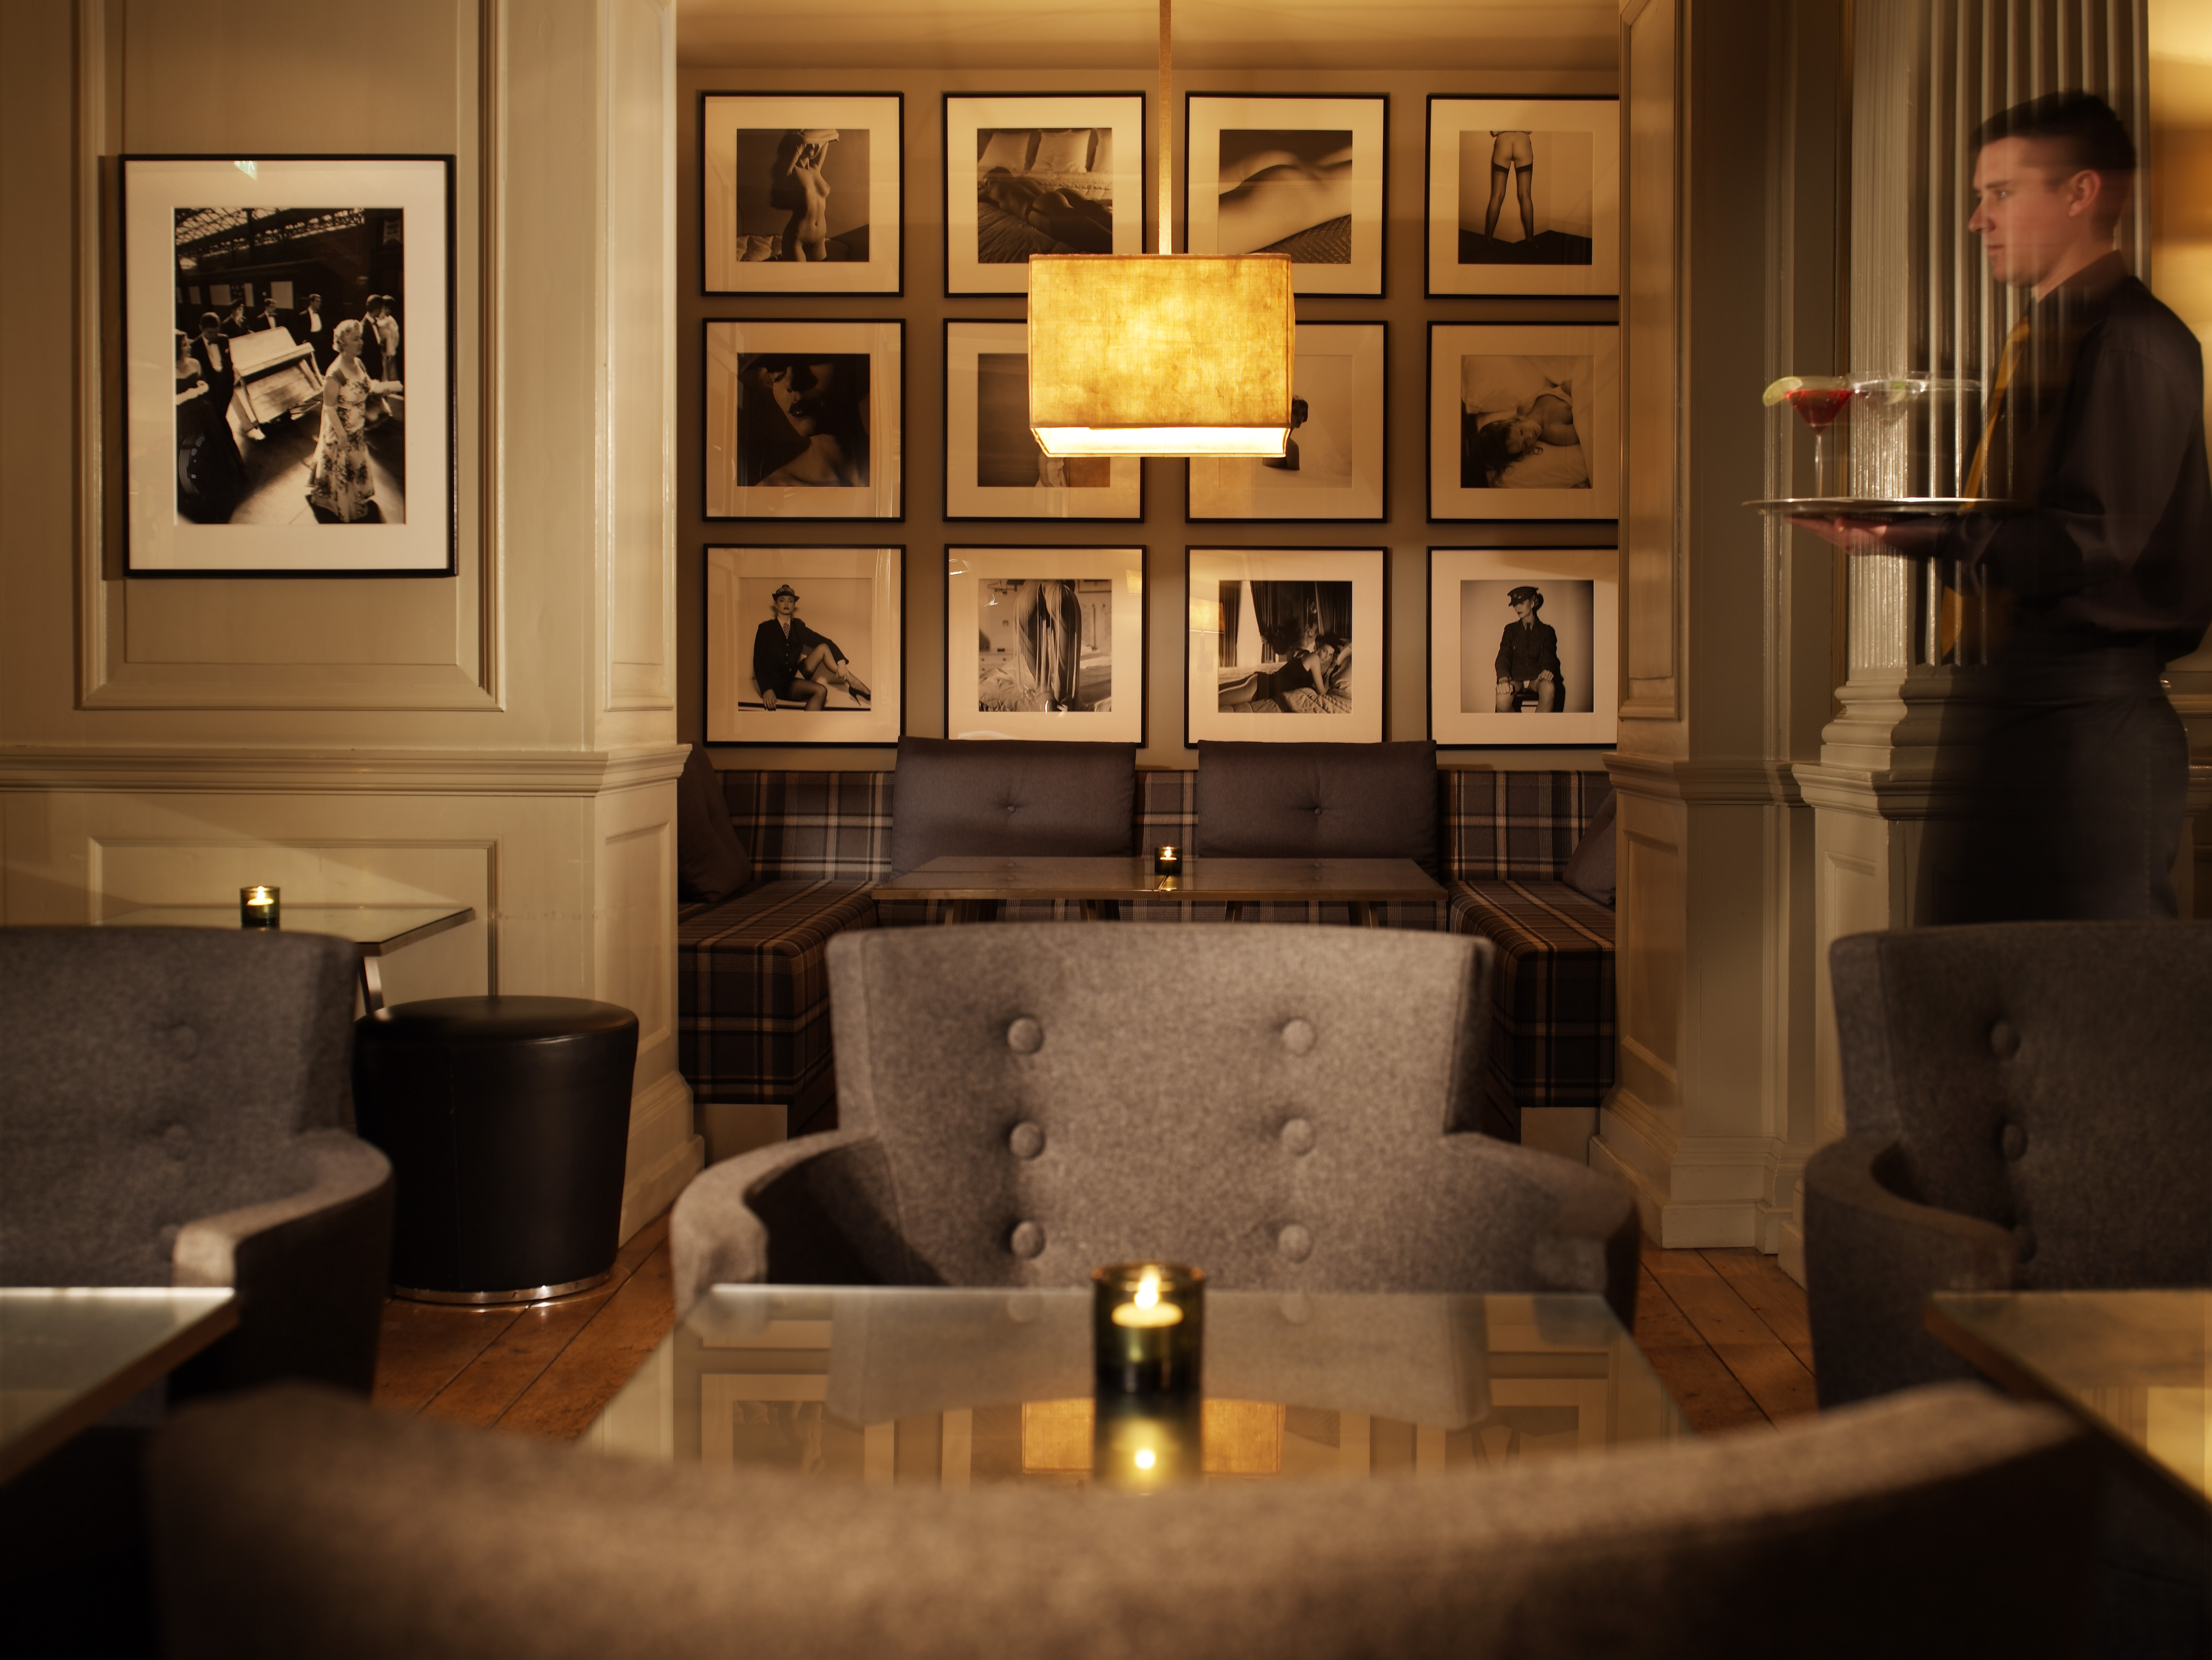 Living Room Bar London Top Ten London Dating Hotspots The Tiny Travellers Top Ten